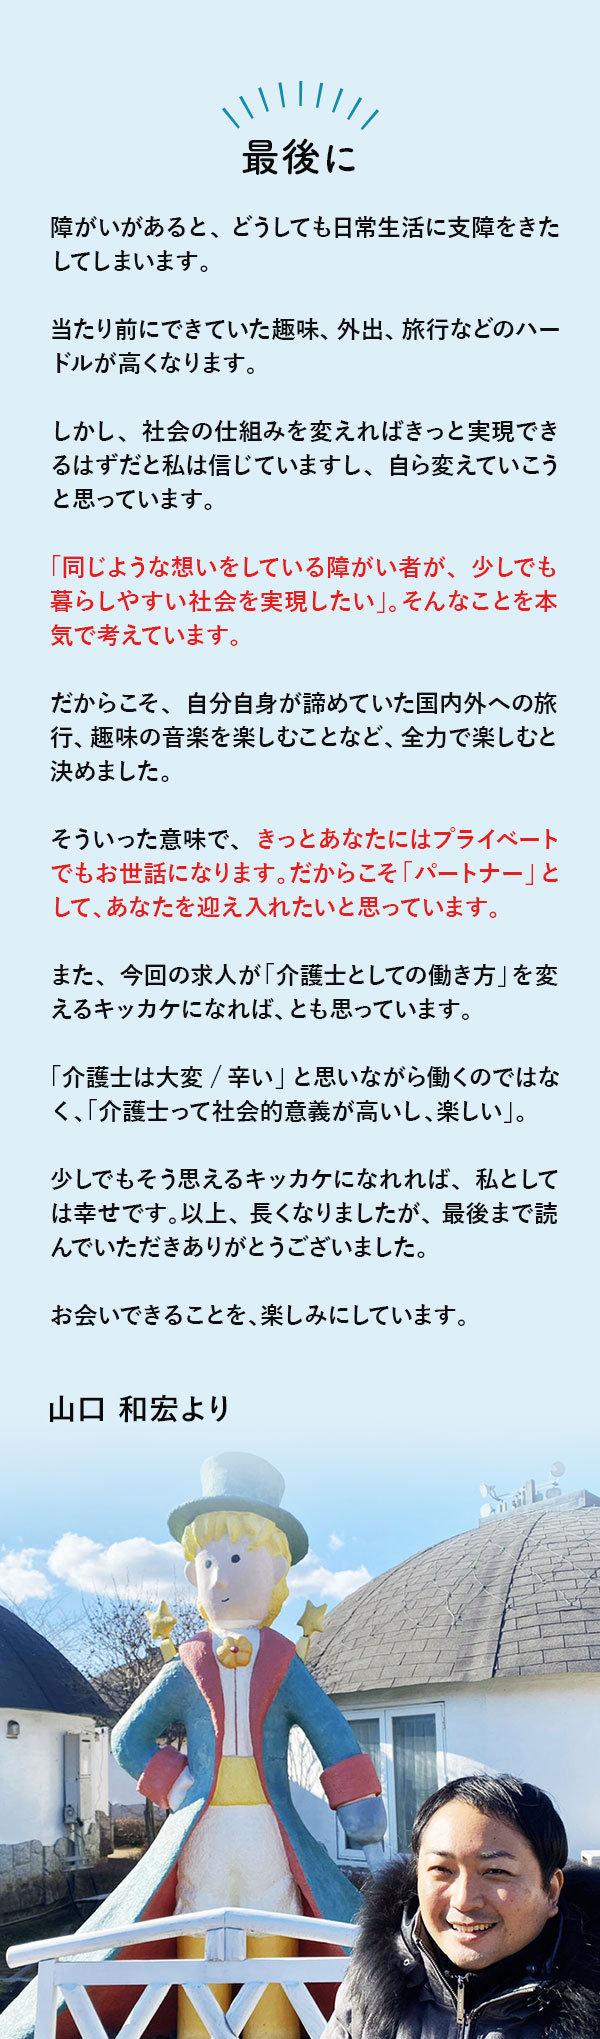 lp_sp_15.jpg